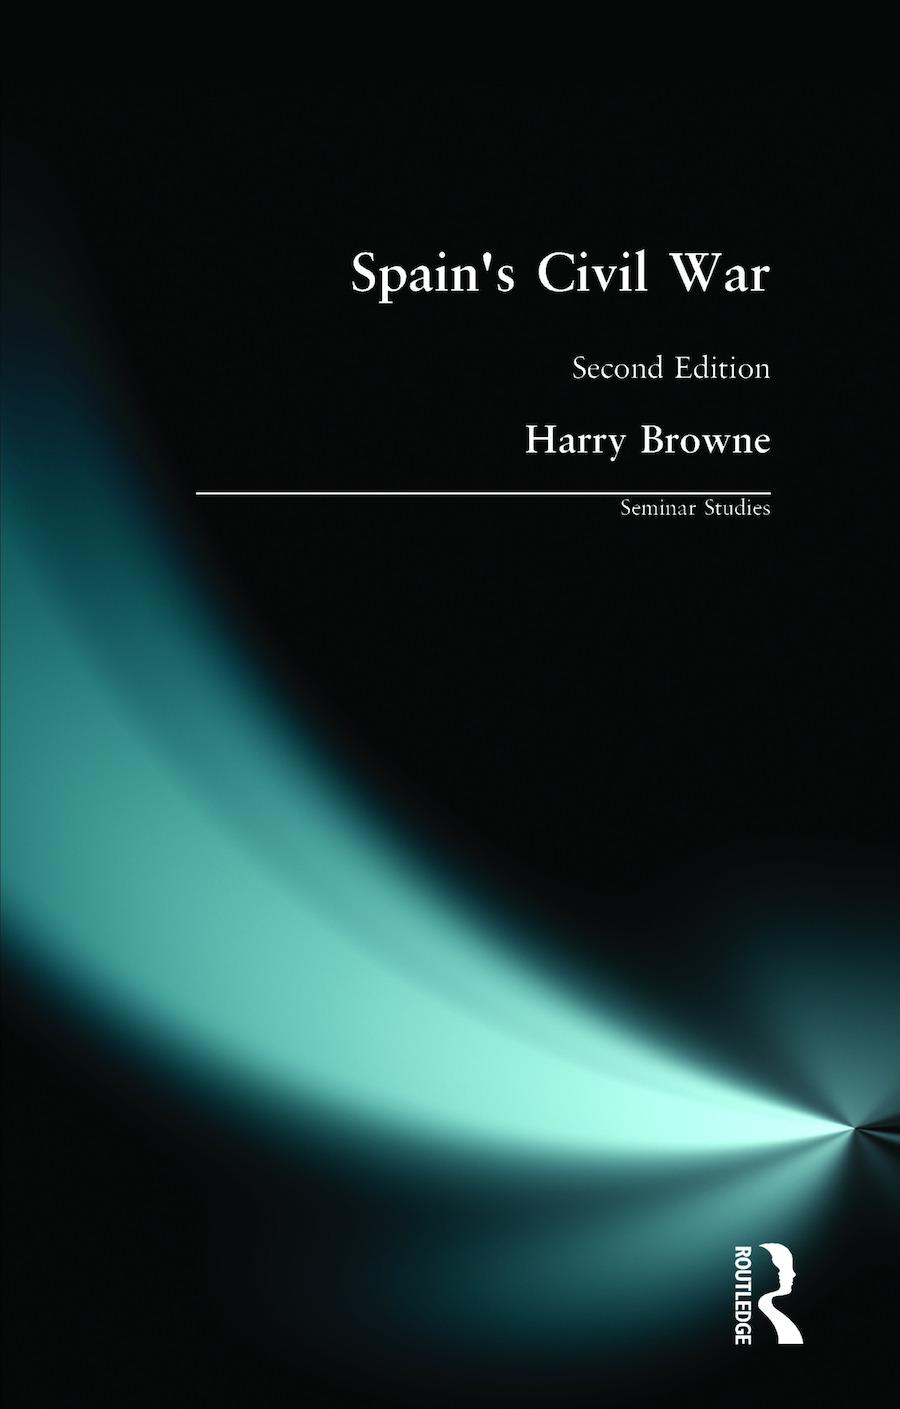 Spain's Civil War